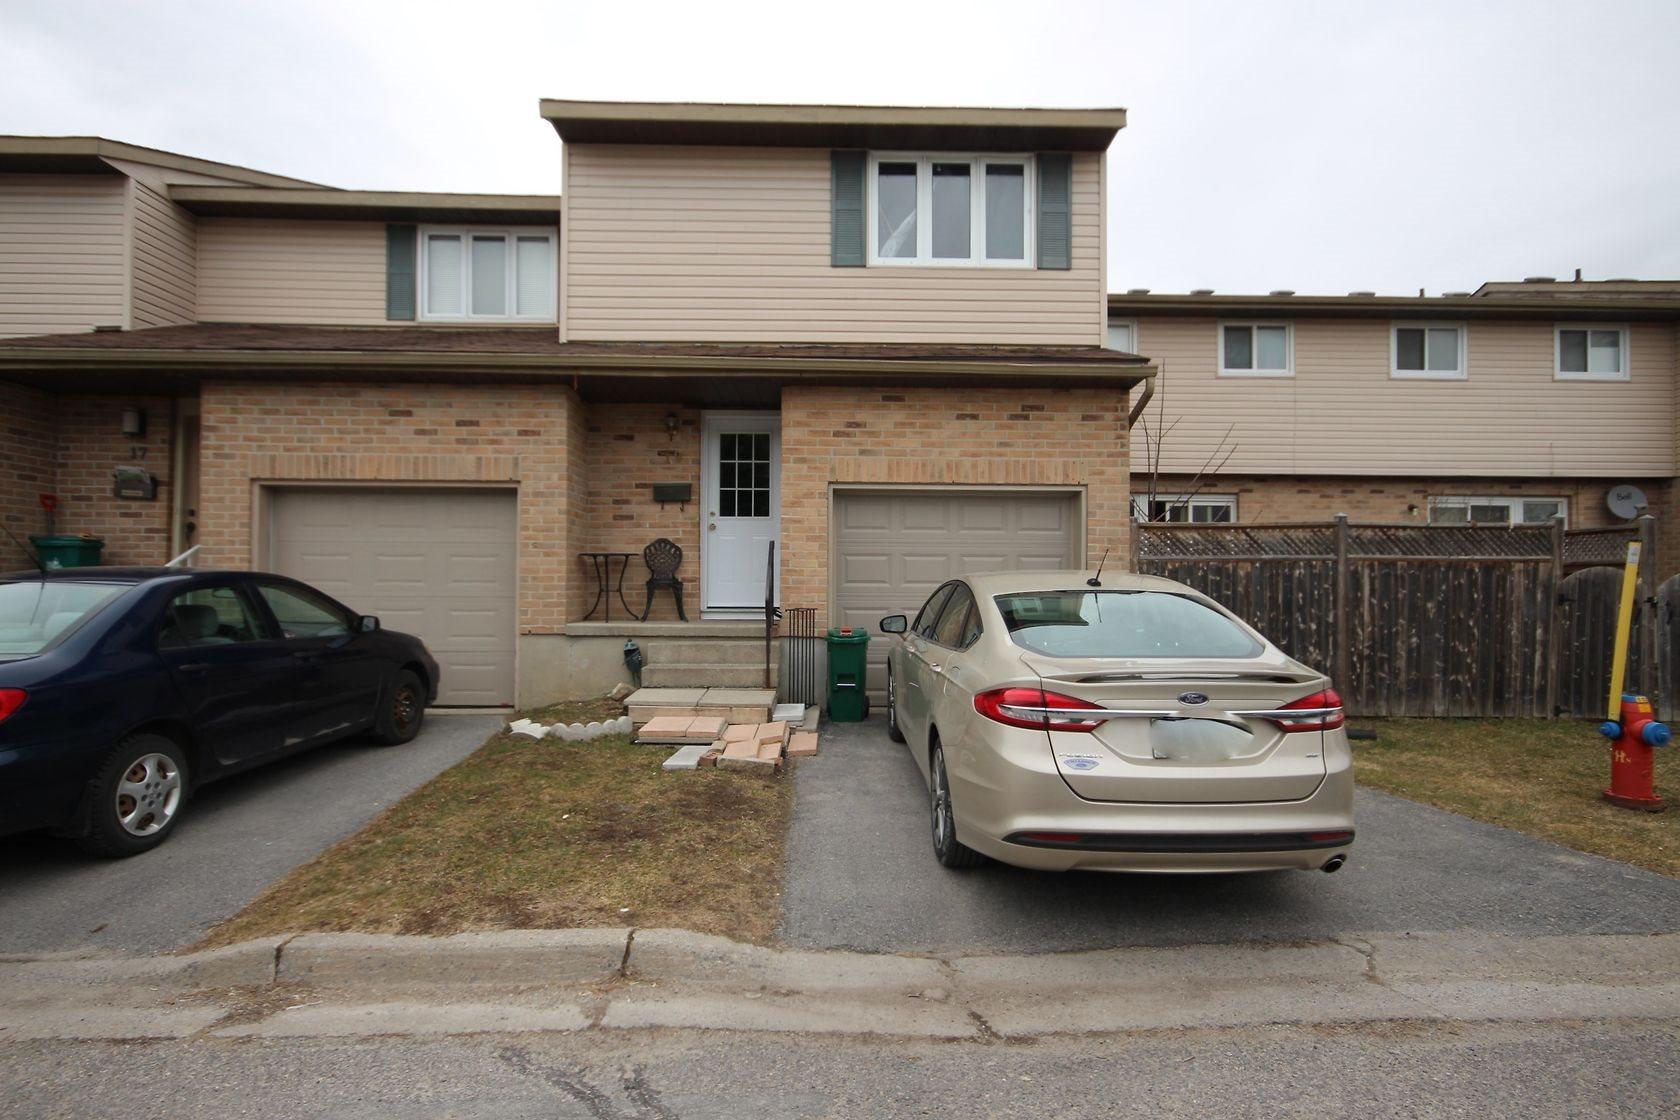 Unit# 19 24 Prince Henry Drive, Kingston, Ontario, Canada